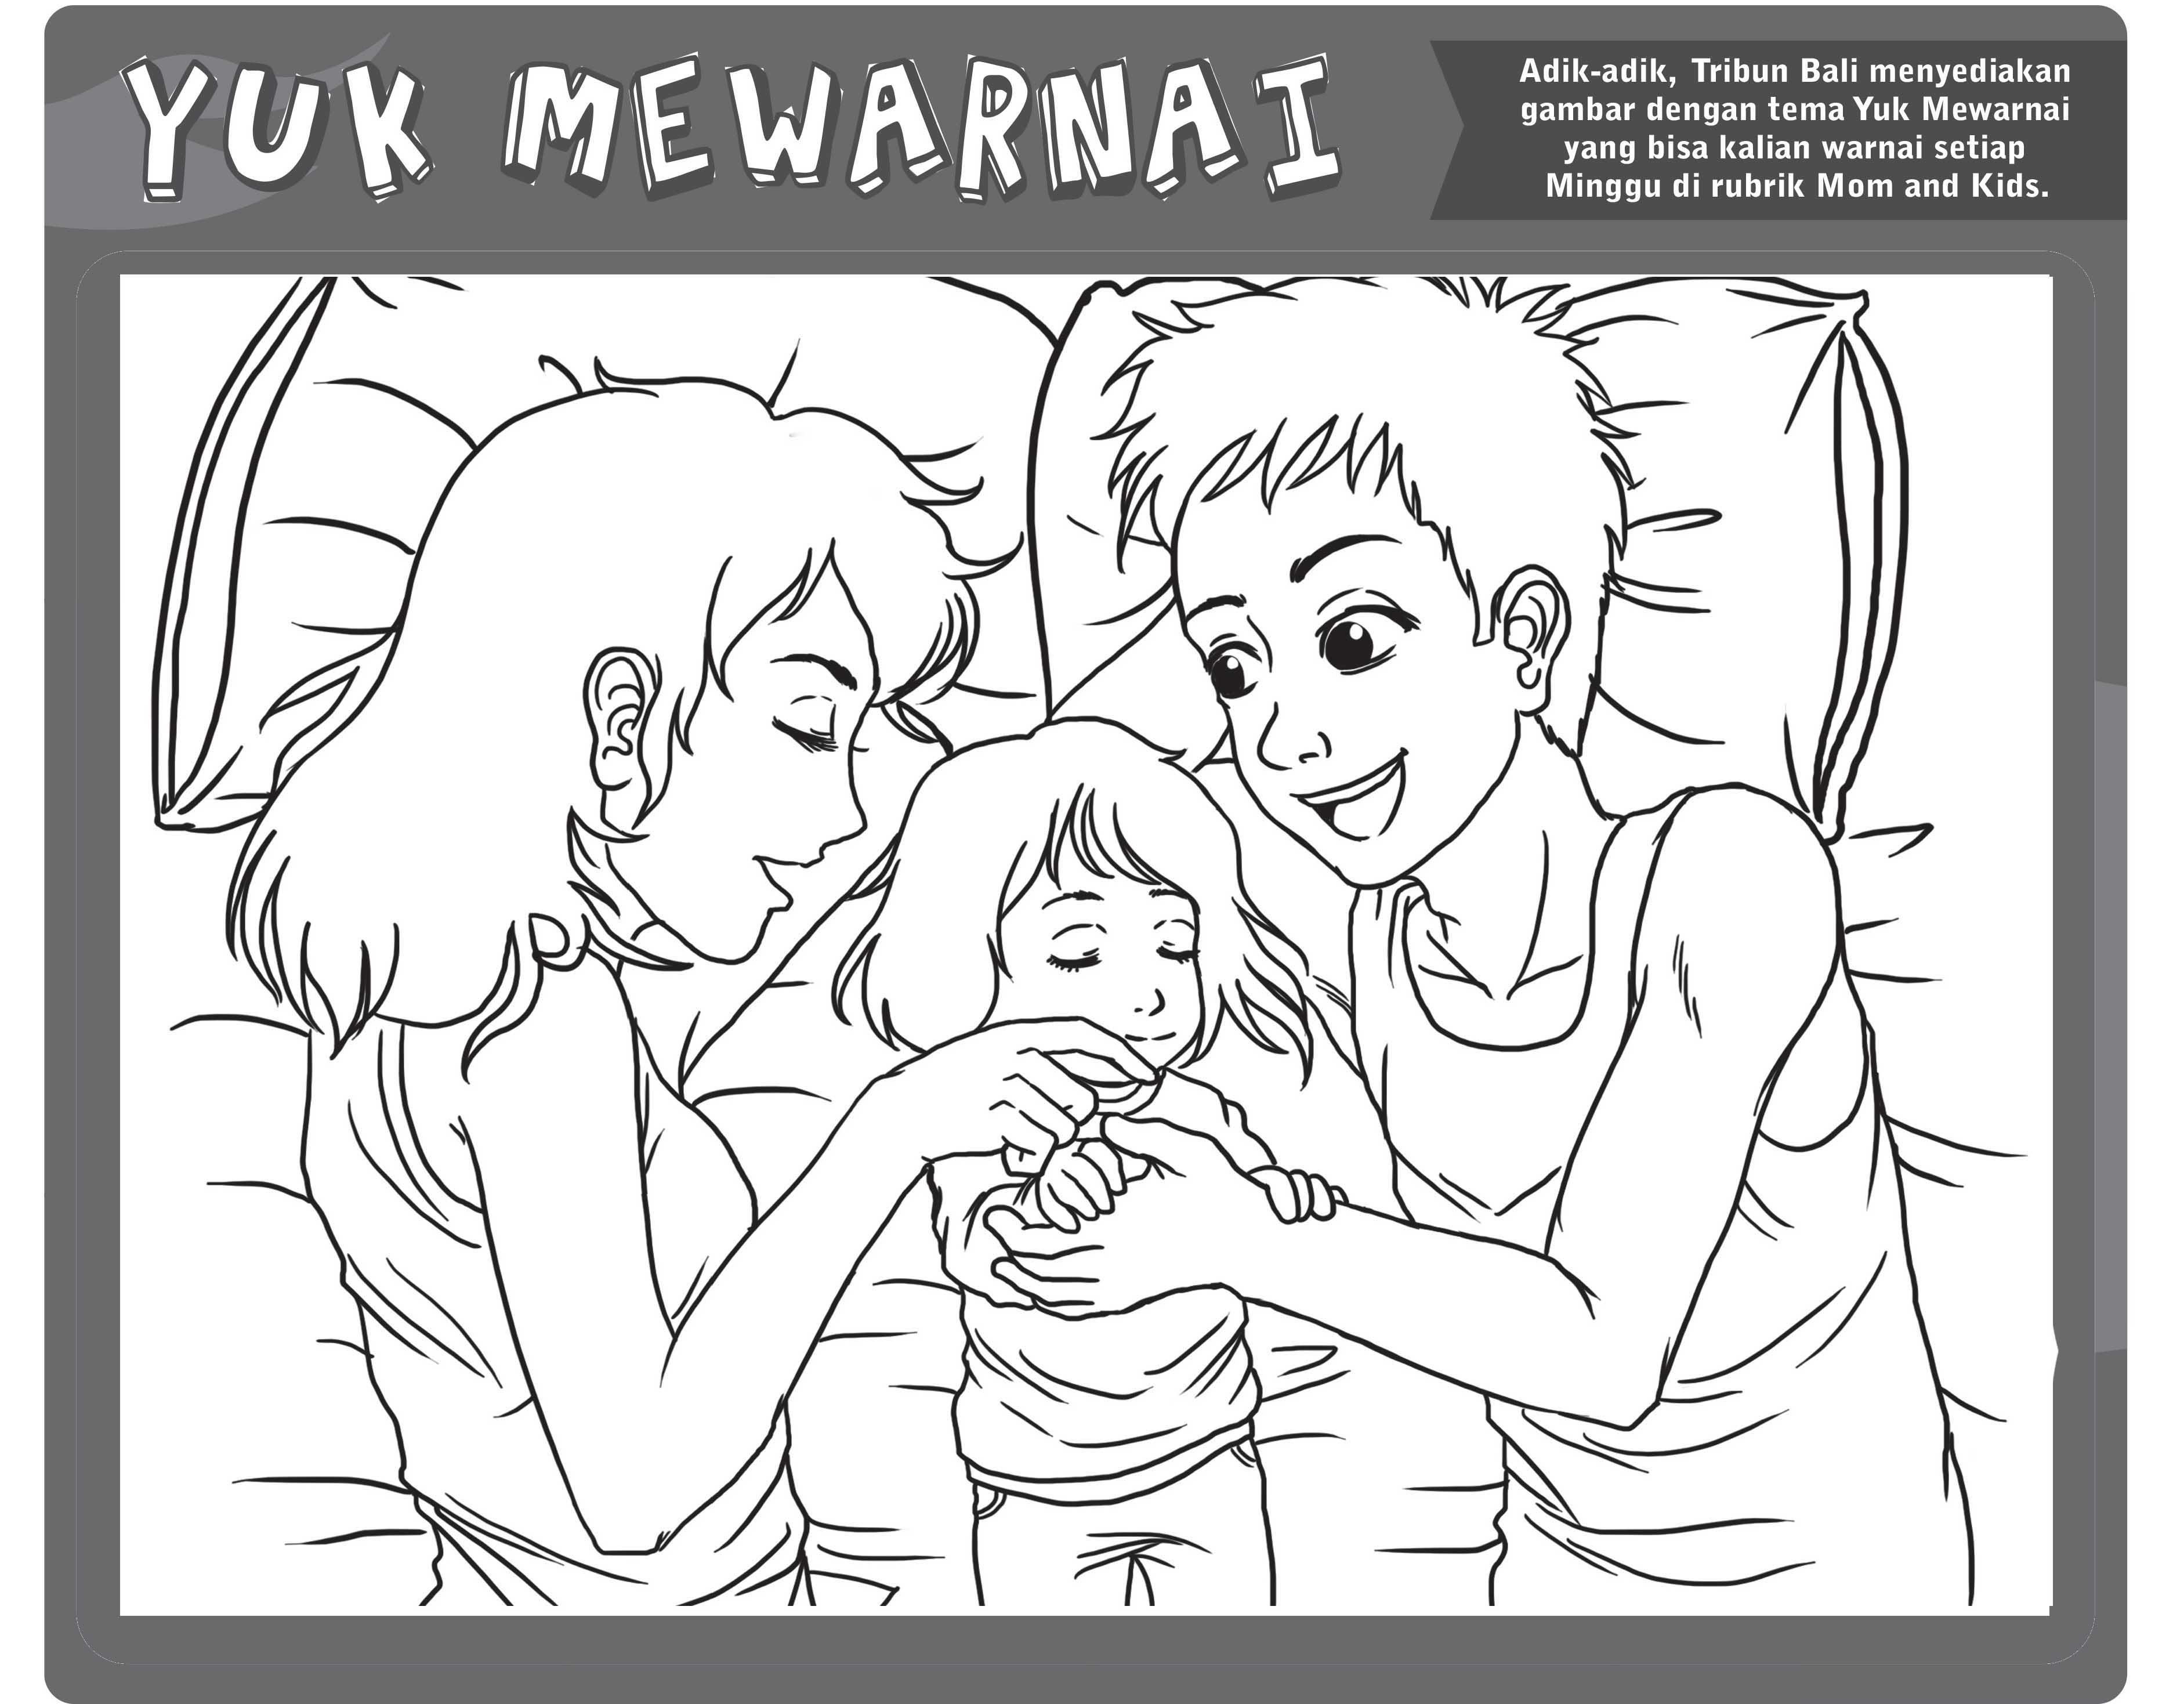 6 Sketsa Gambar Mewarnai Untuk Buah Hati Silakan Disave Tribun Bali